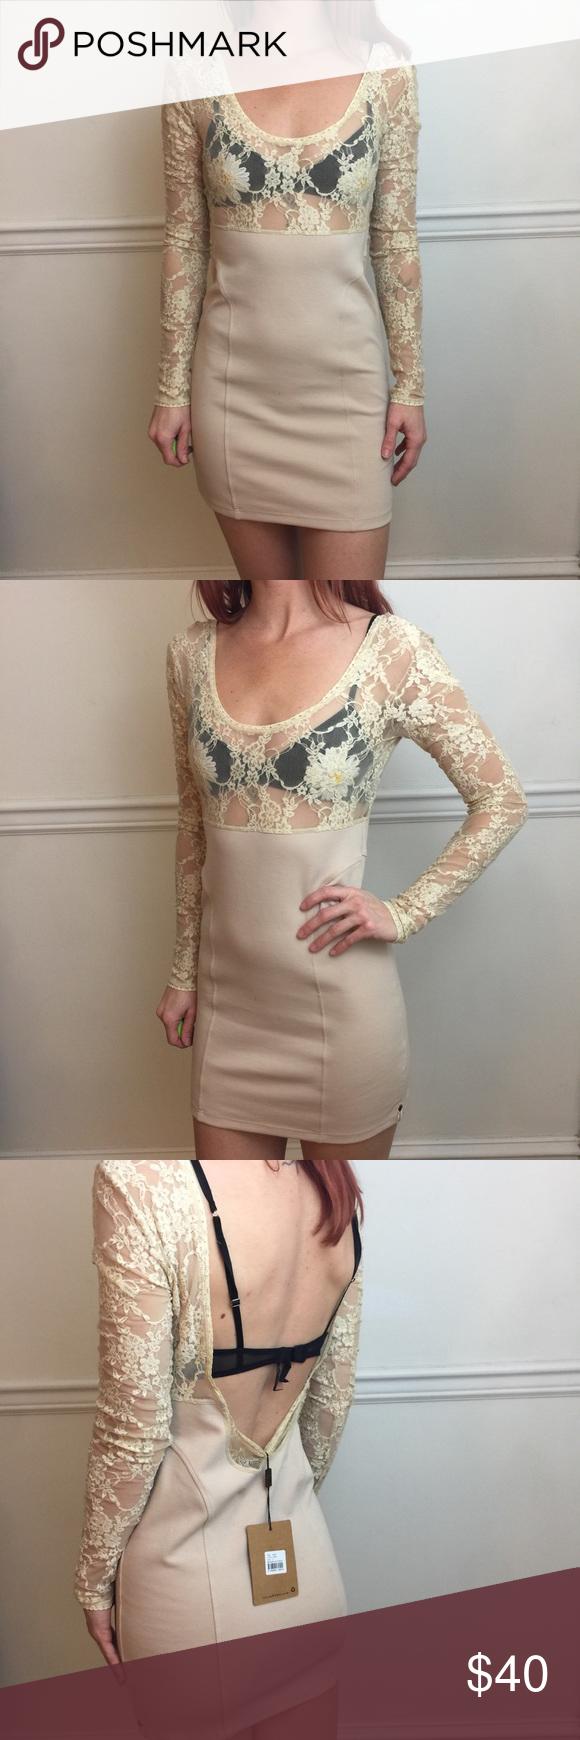 One Teaspoon Tan Lace Yoke Long Sleeve Dress Nwt Long Sleeve Dress Dresses Clothes Design [ 1740 x 580 Pixel ]